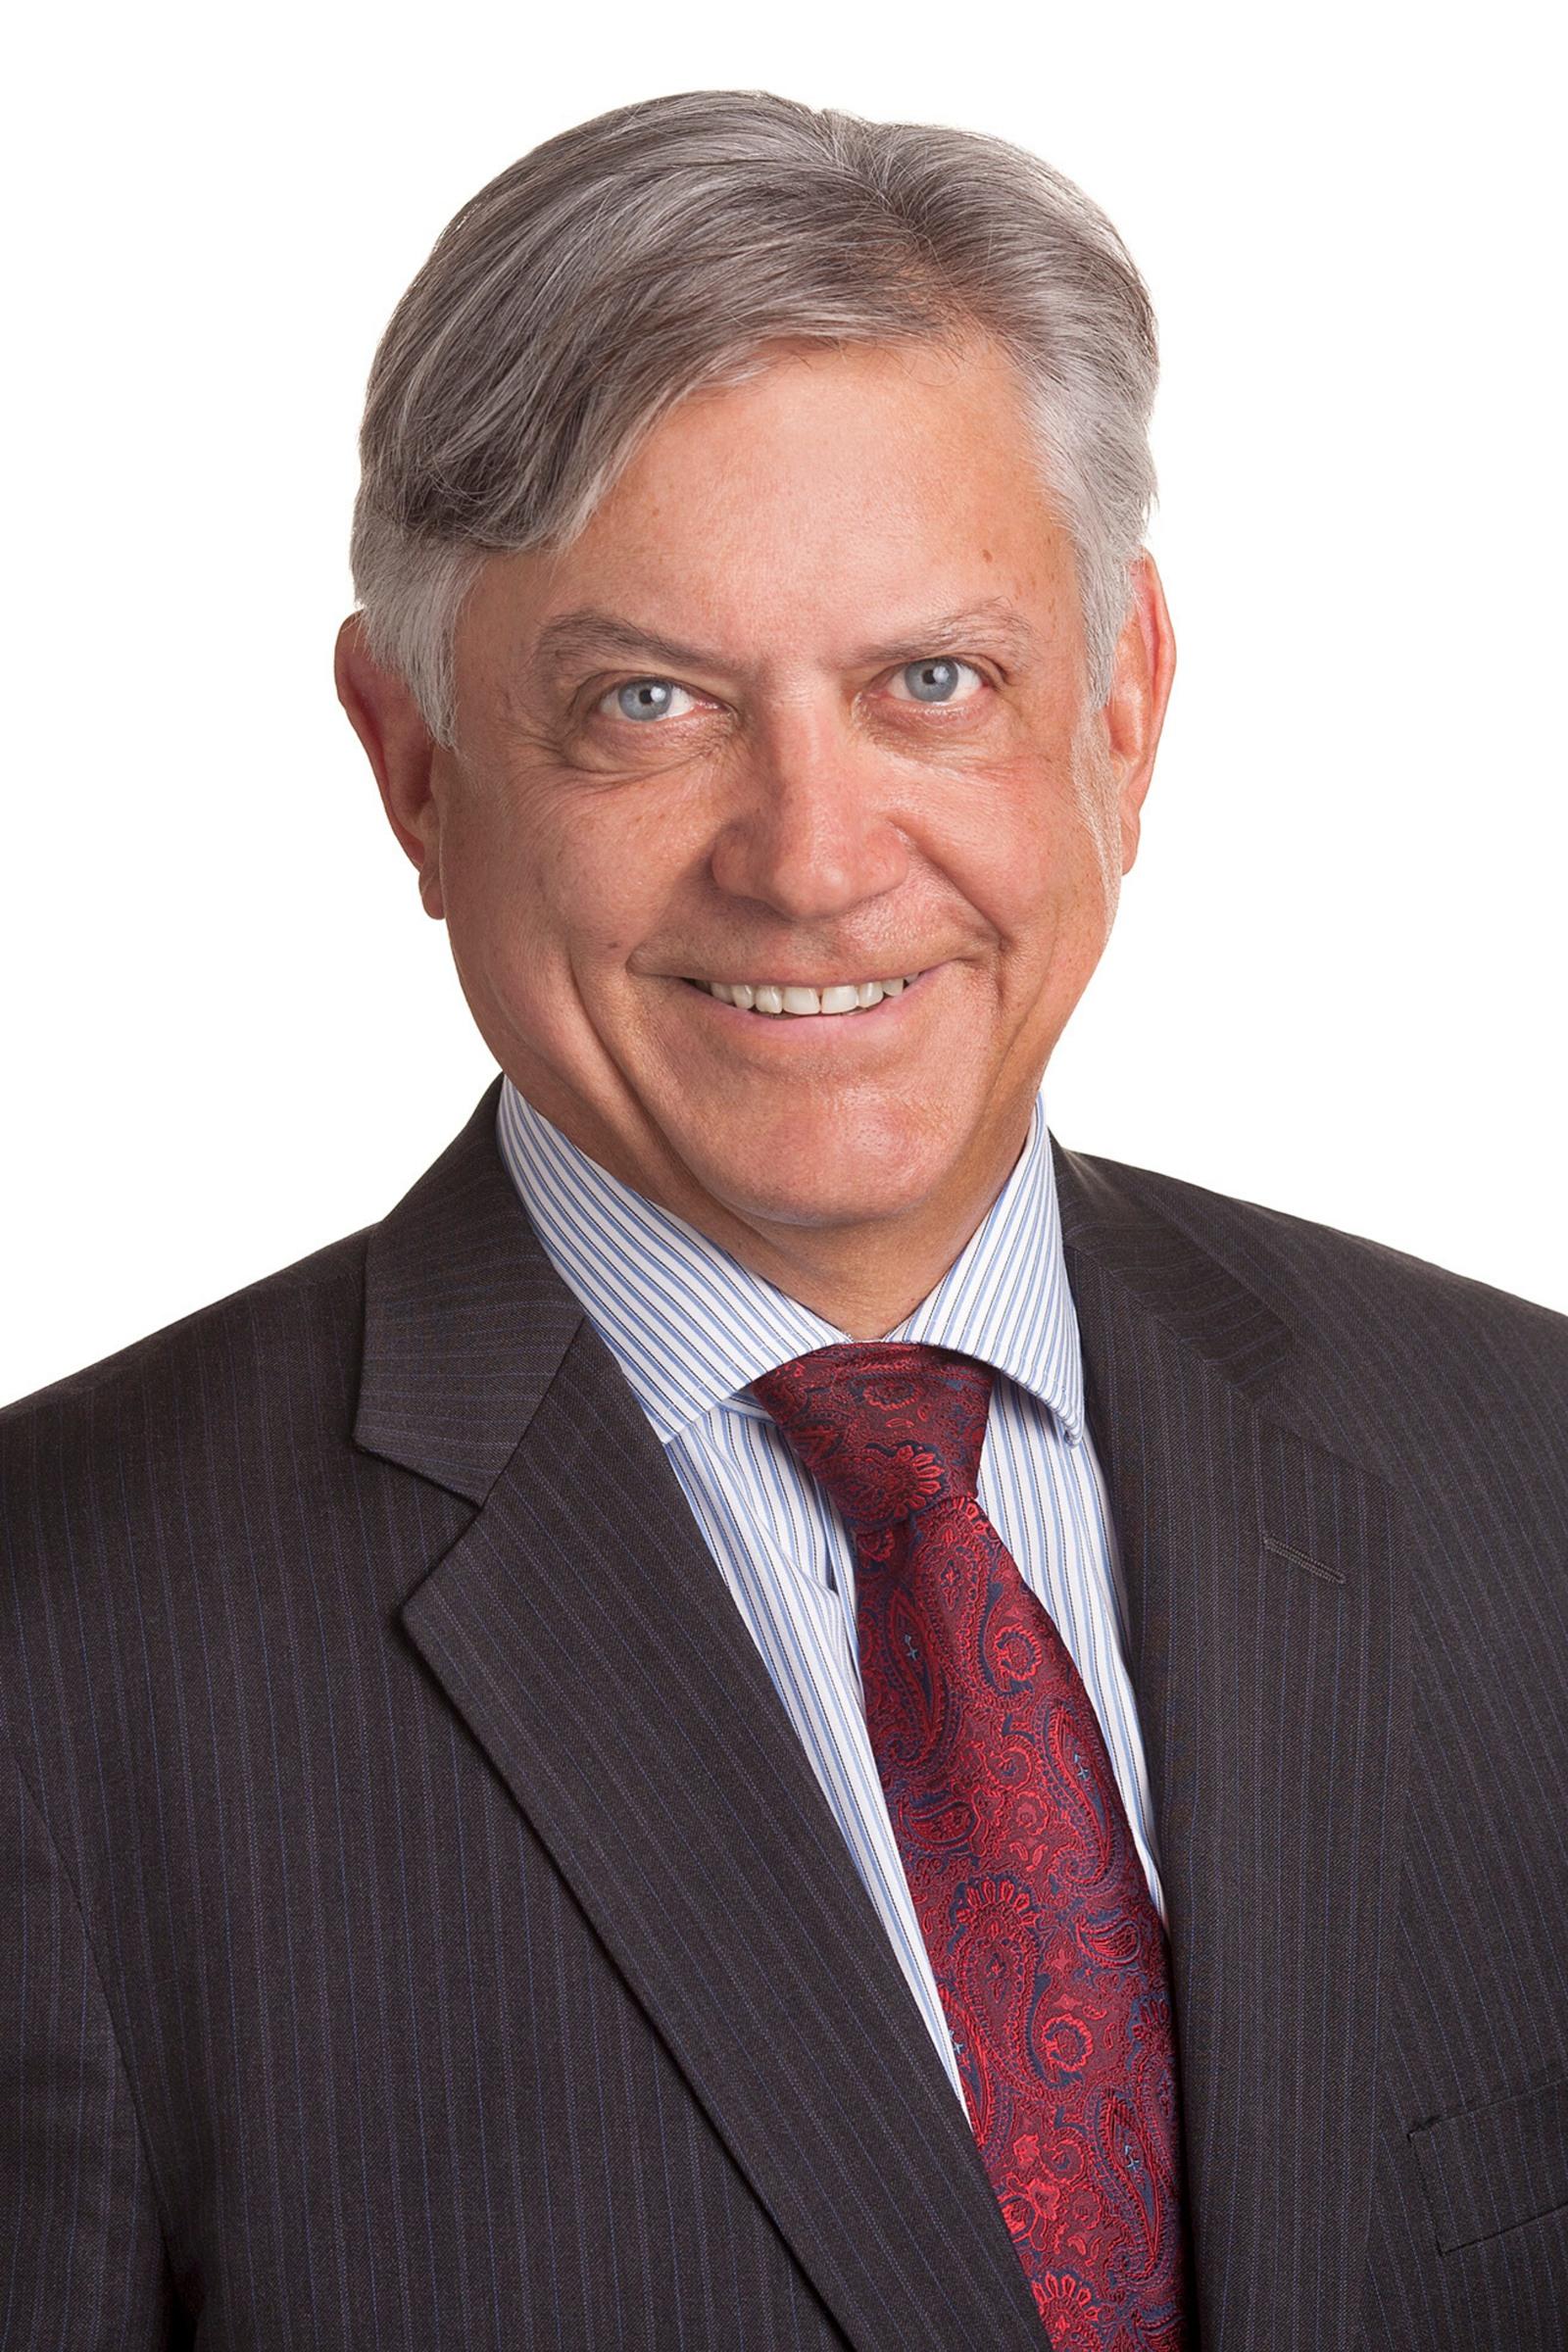 John Stempeck